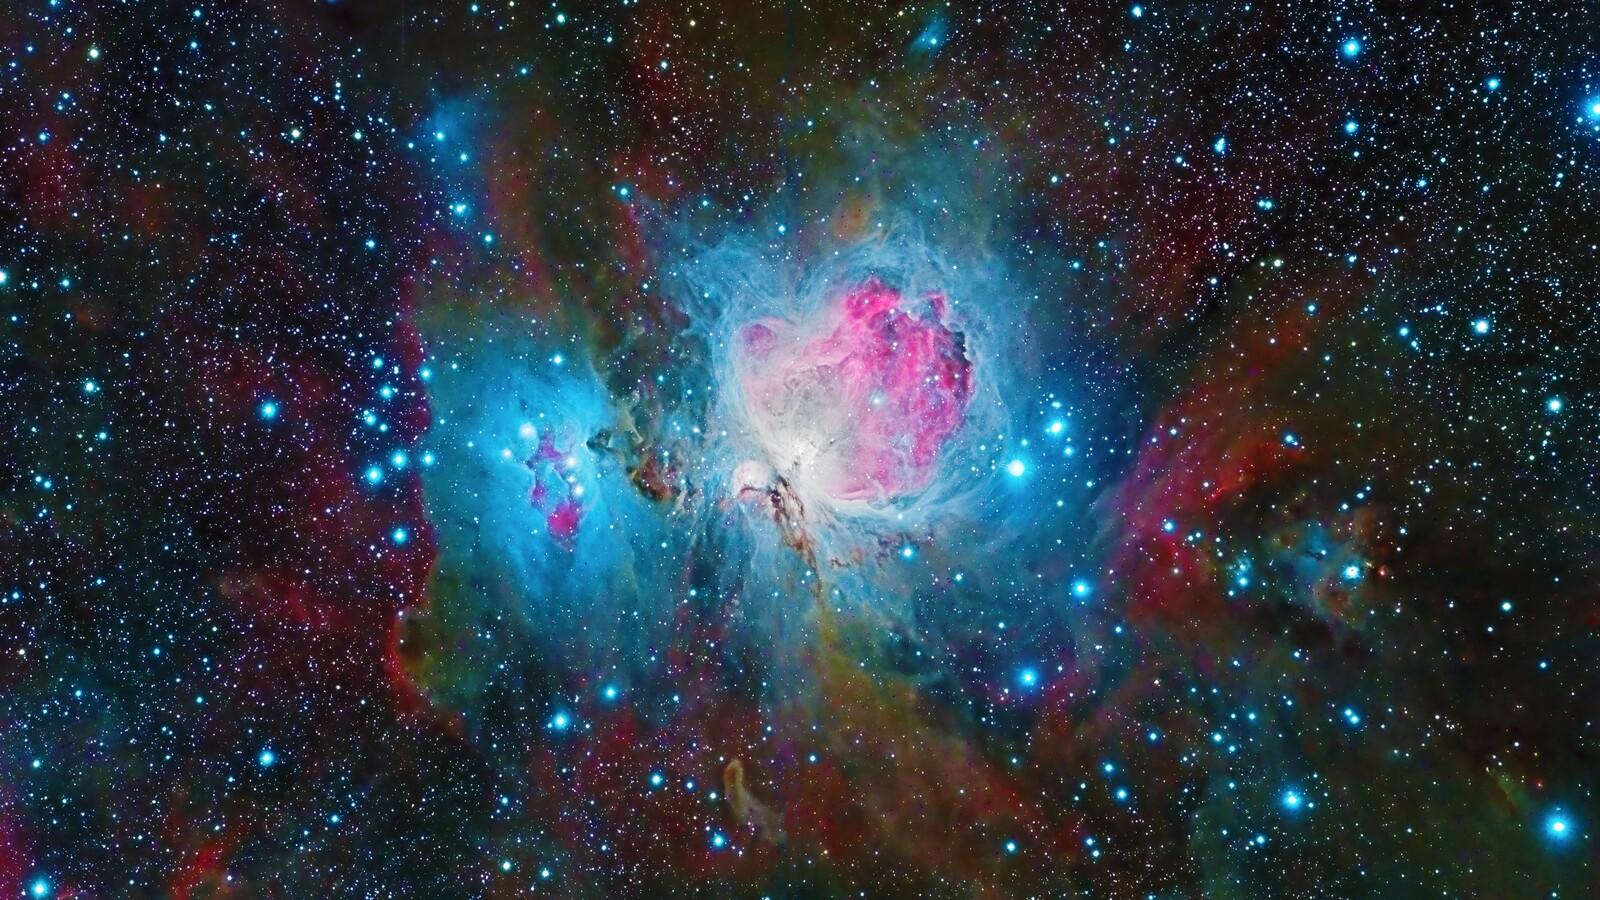 1600x900 nebula space galaxy colorful 4k 1600x900 - 4k resolution space wallpaper ...